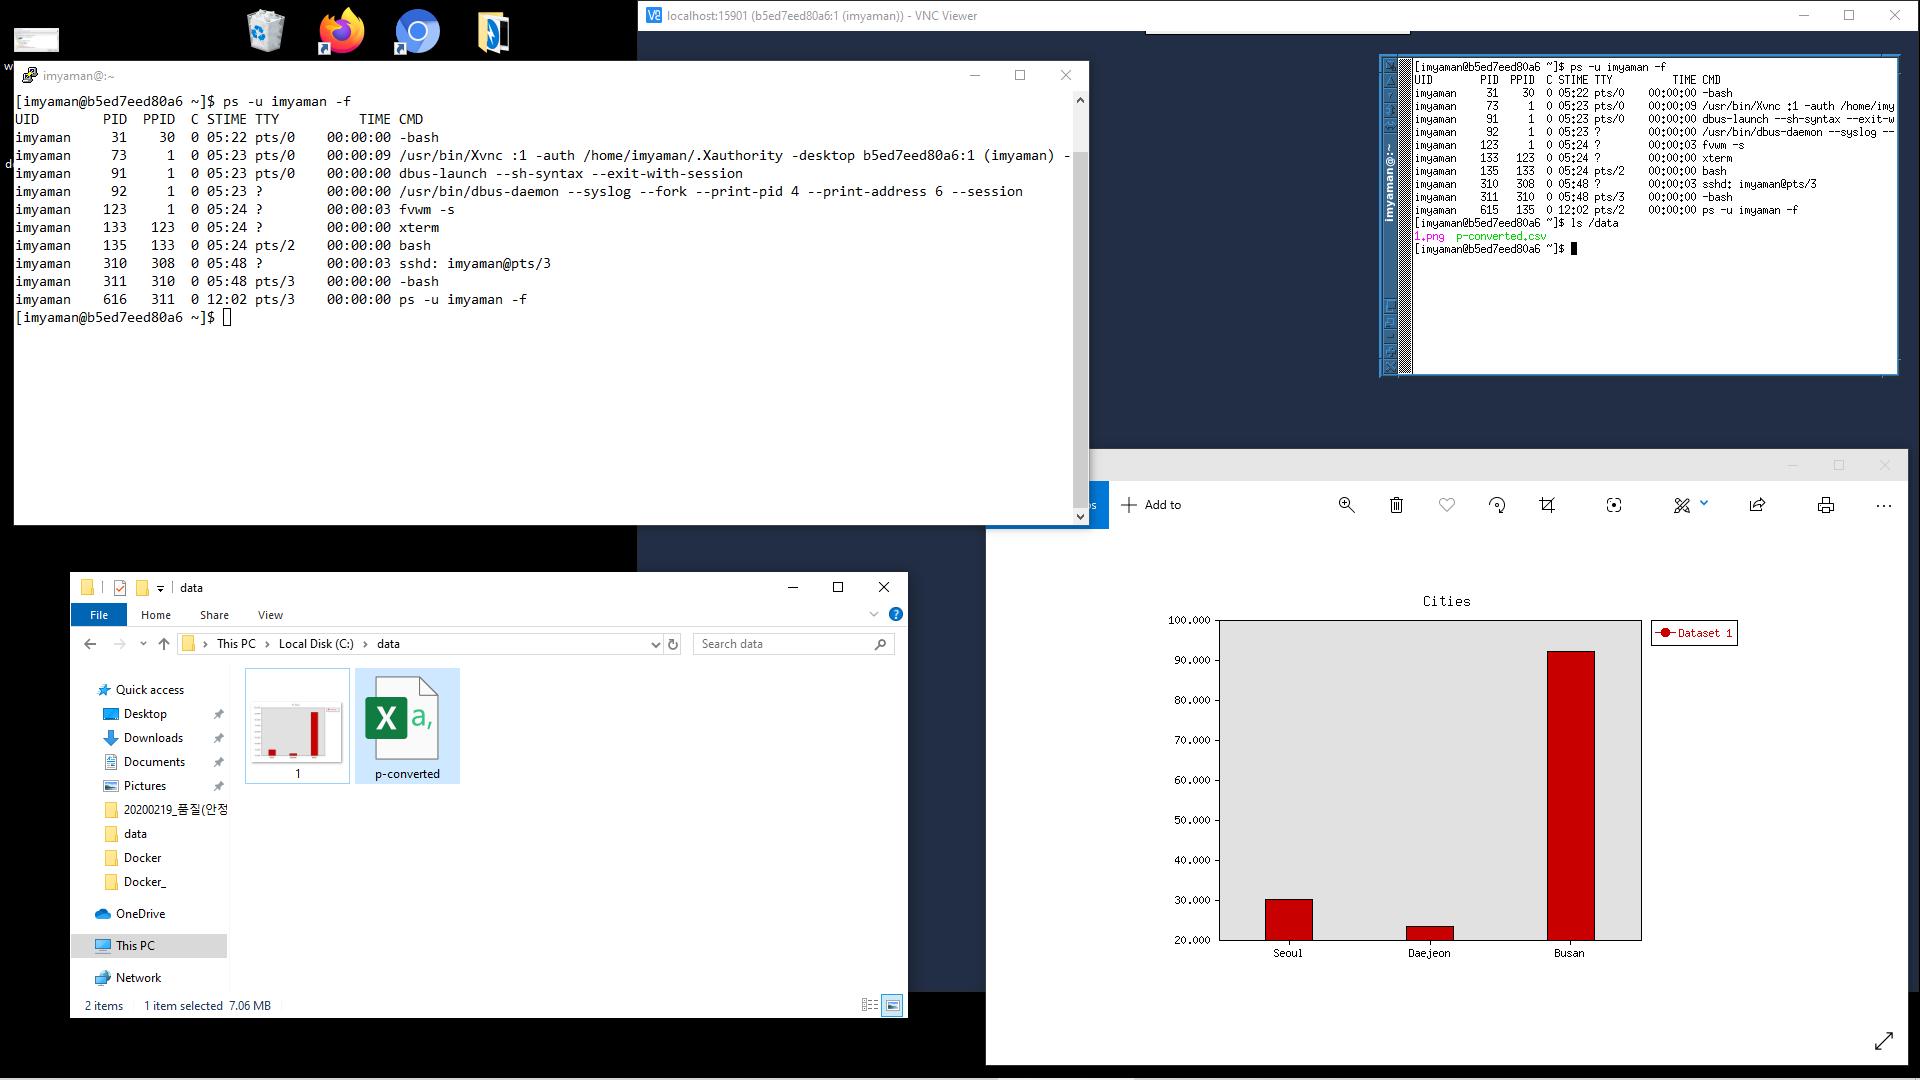 https://weblog.youre.space/vergence/uploads/docker_windows10_20200503.png